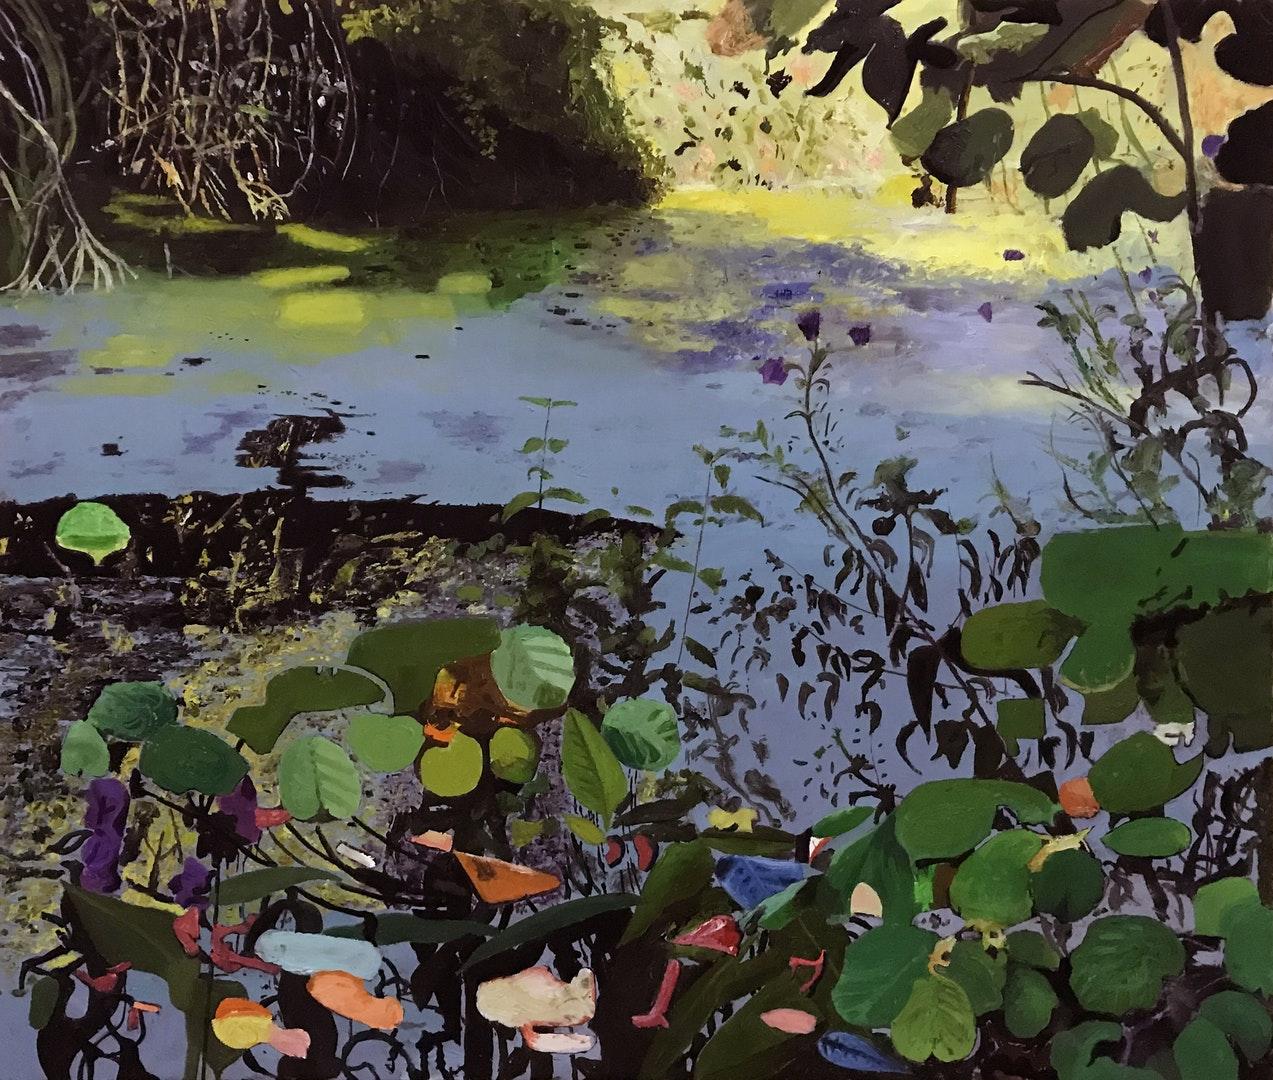 Iain Nicholls,  Elsecar Canal,  Oil on canvas, 91 x 122 x 3 cm,  http://www.iain-nicholls.com